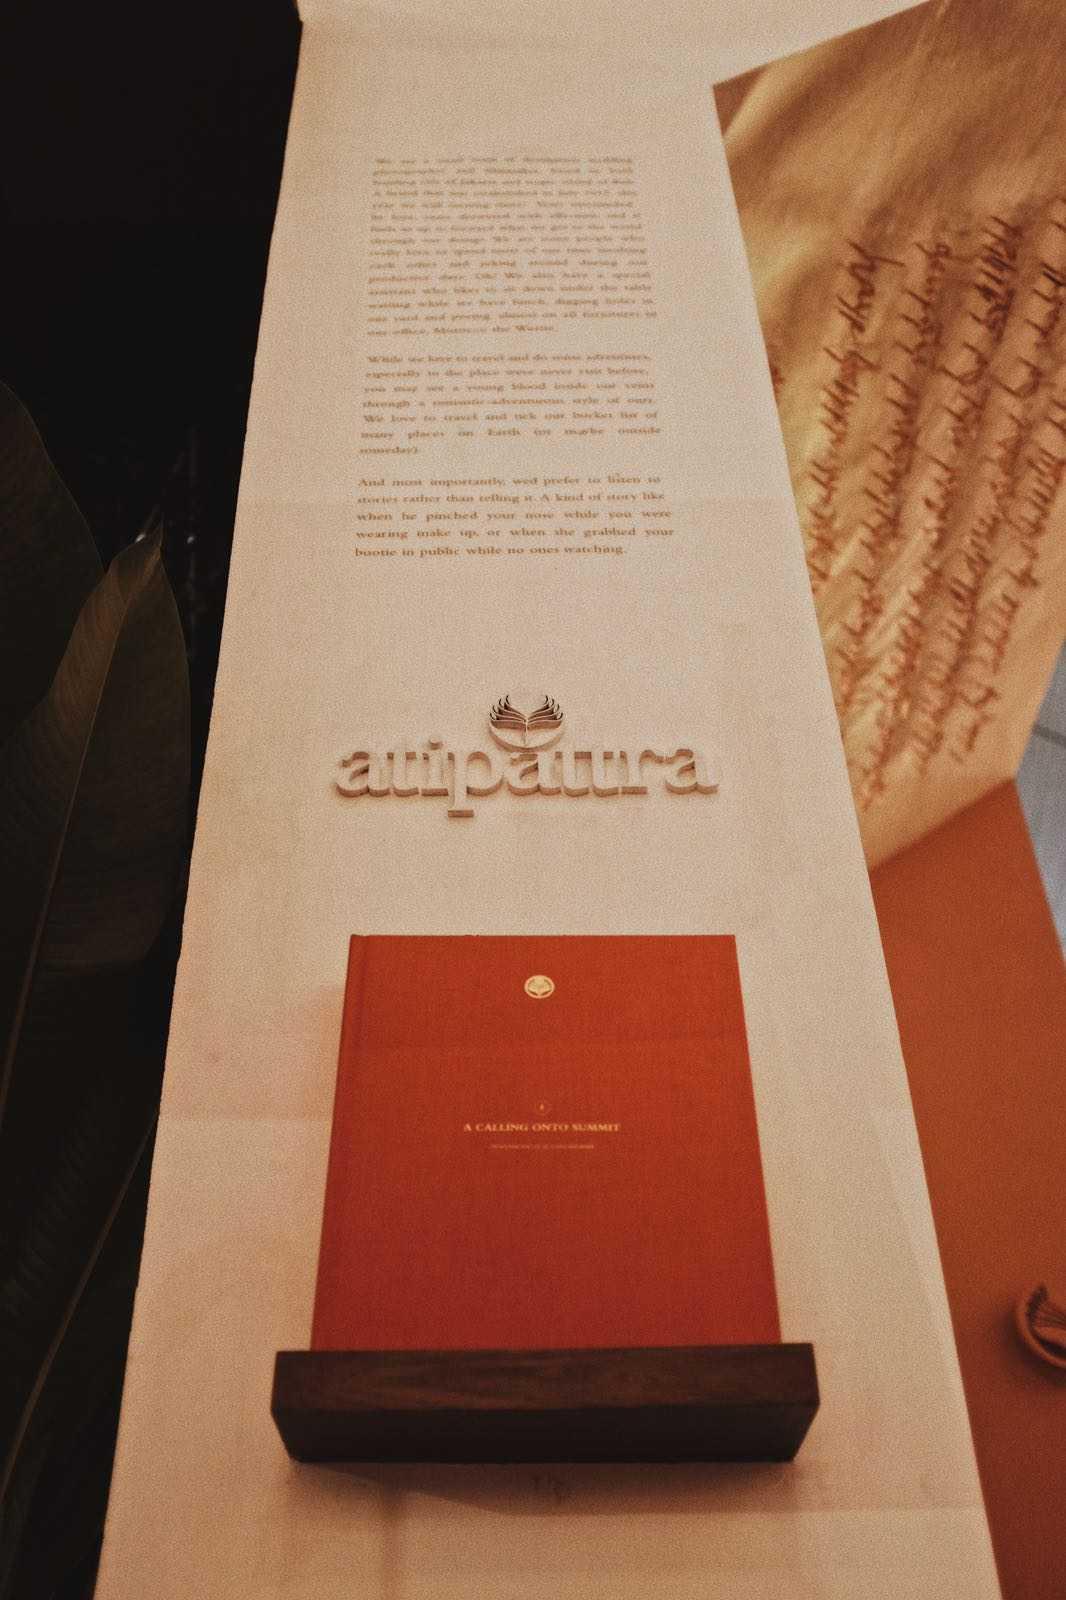 Arkara - Interior Contractor Atipattra Booth Jl. Bsd Grand Boulevard No.1, Pagedangan, Tangerang, Banten 15339, Indonesia Jl. Bsd Grand Boulevard No.1, Pagedangan, Tangerang, Banten 15339, Indonesia Arcon-Interior-Furniture-Contractor-Atipattra-Booth  69880